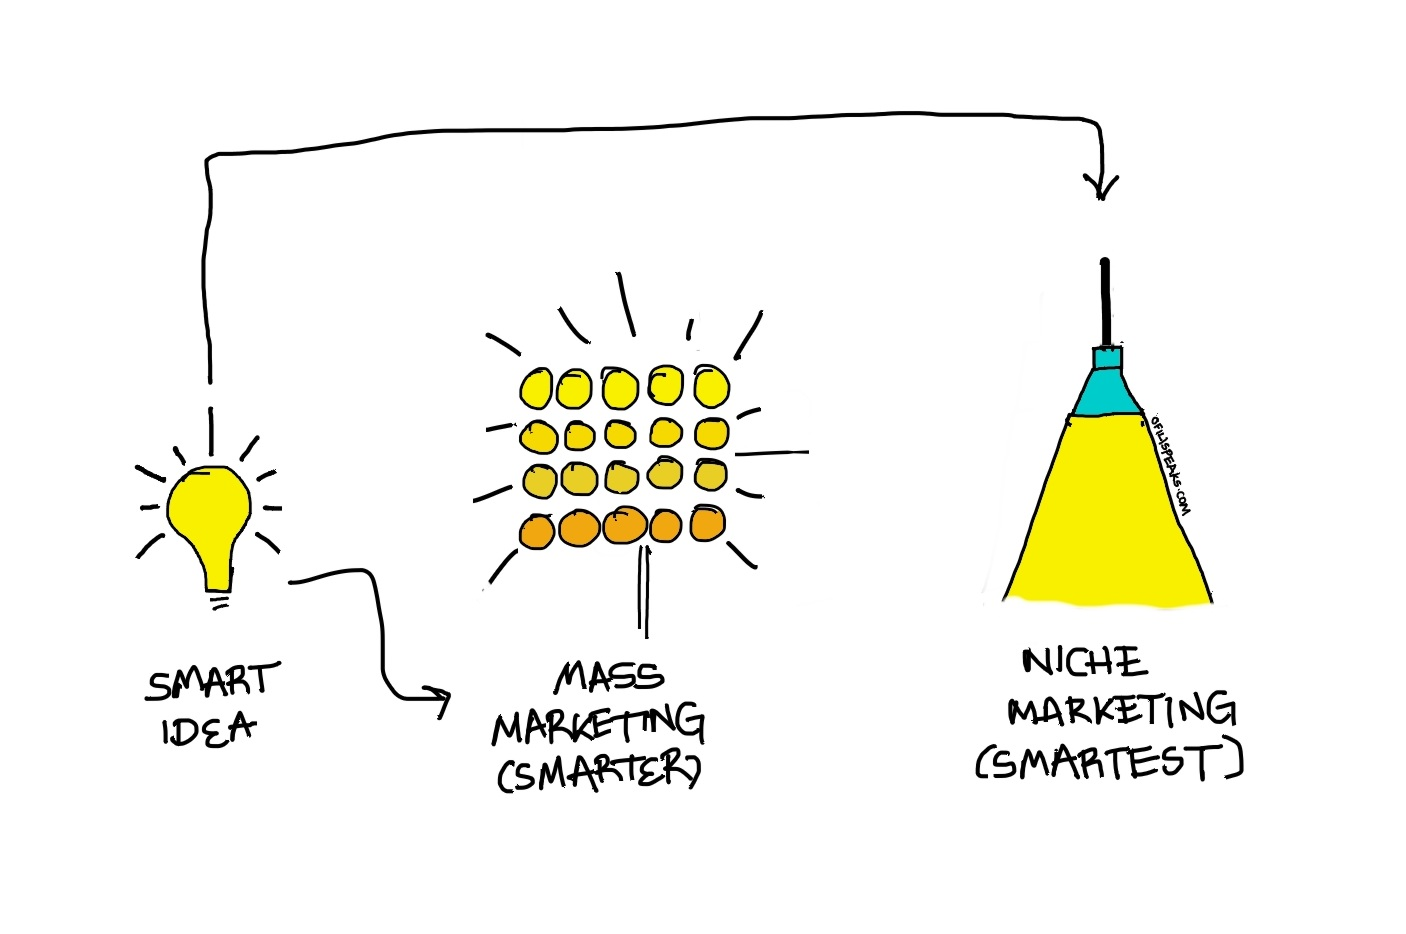 Niche market – BUSINESS ADMINISTRATION